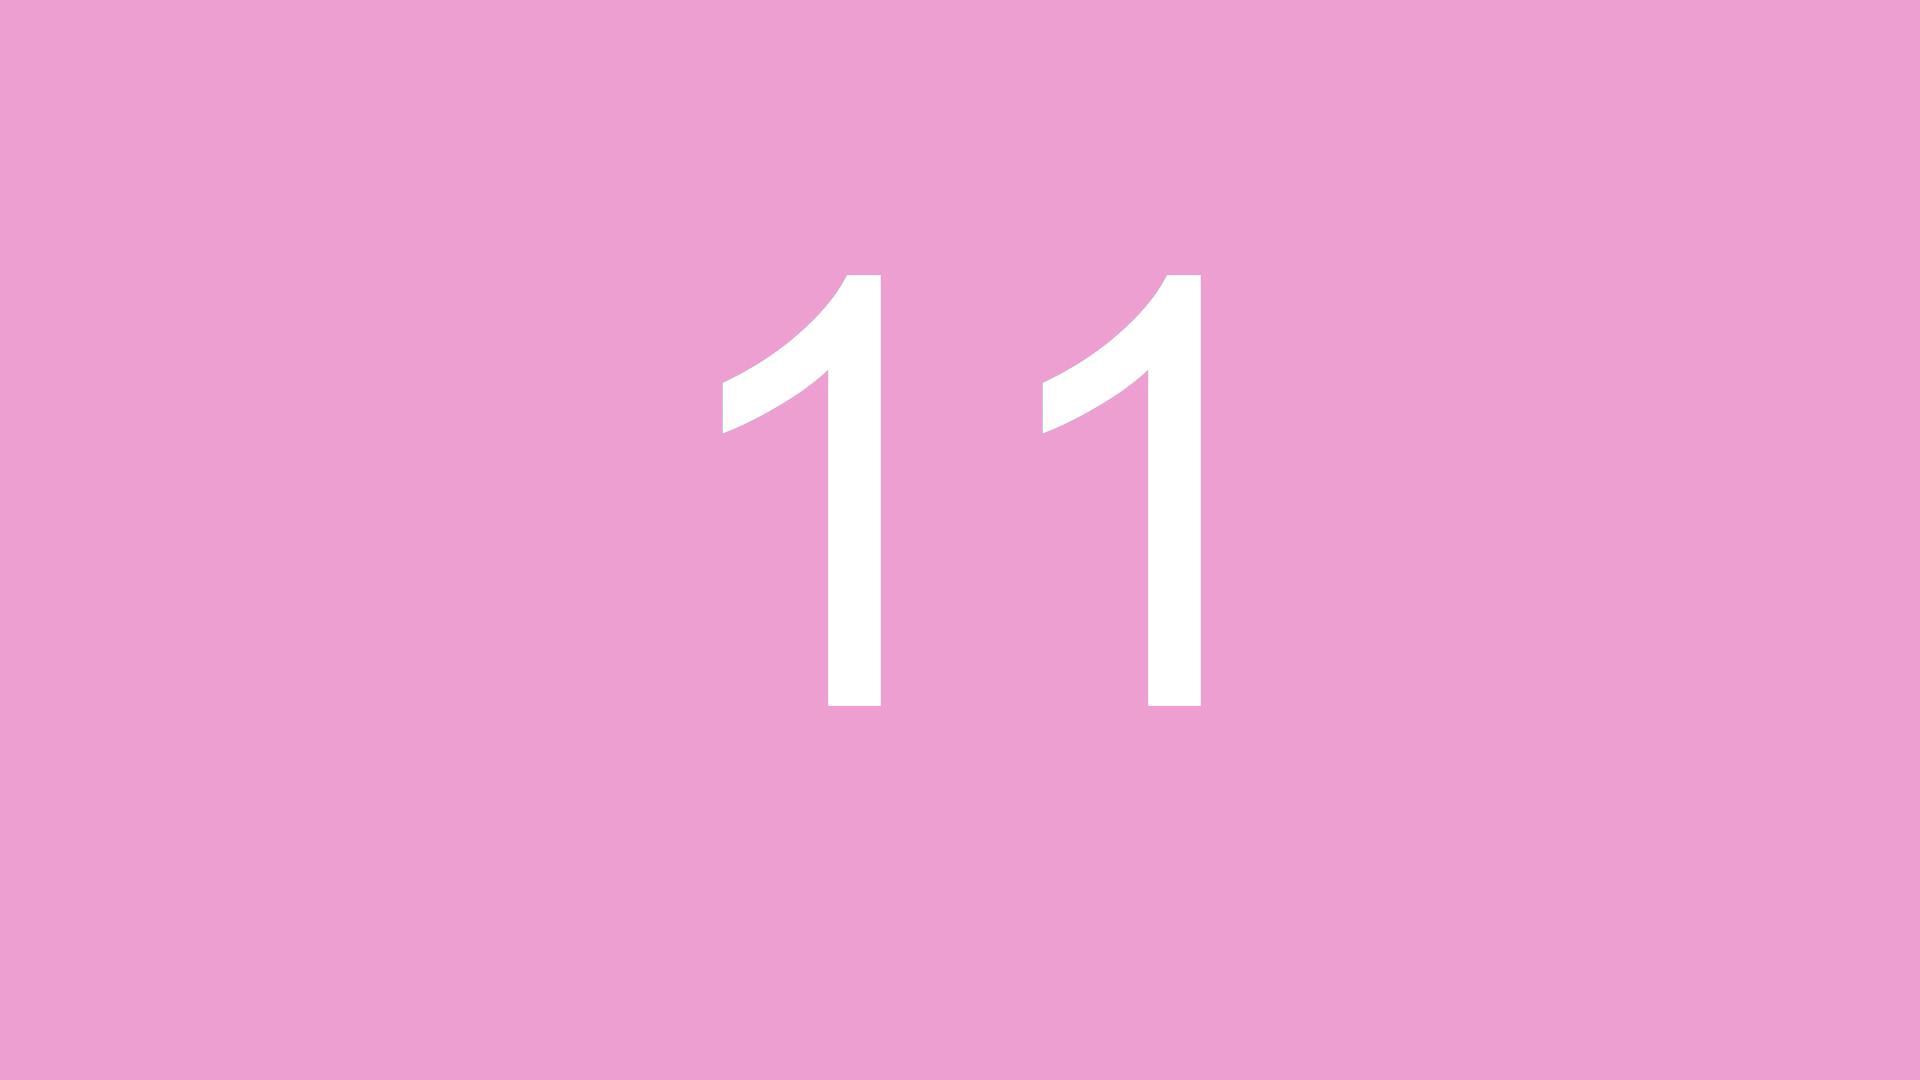 _0070_Pink_11